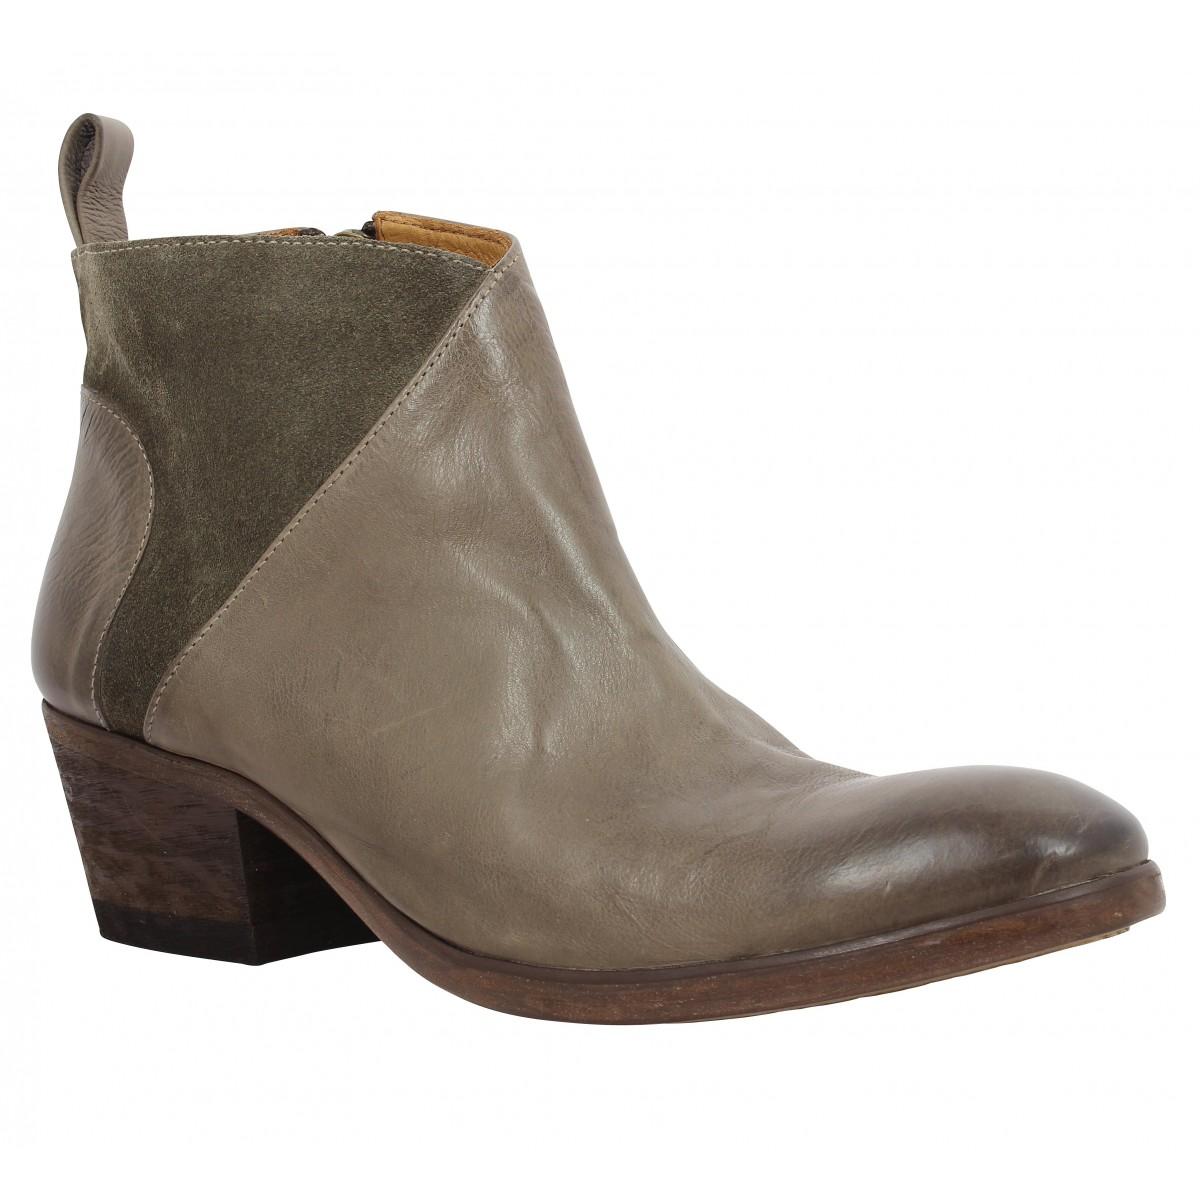 Atelier Voisin TaupeFanny Chaussures 7174 Femme qpzMSUV